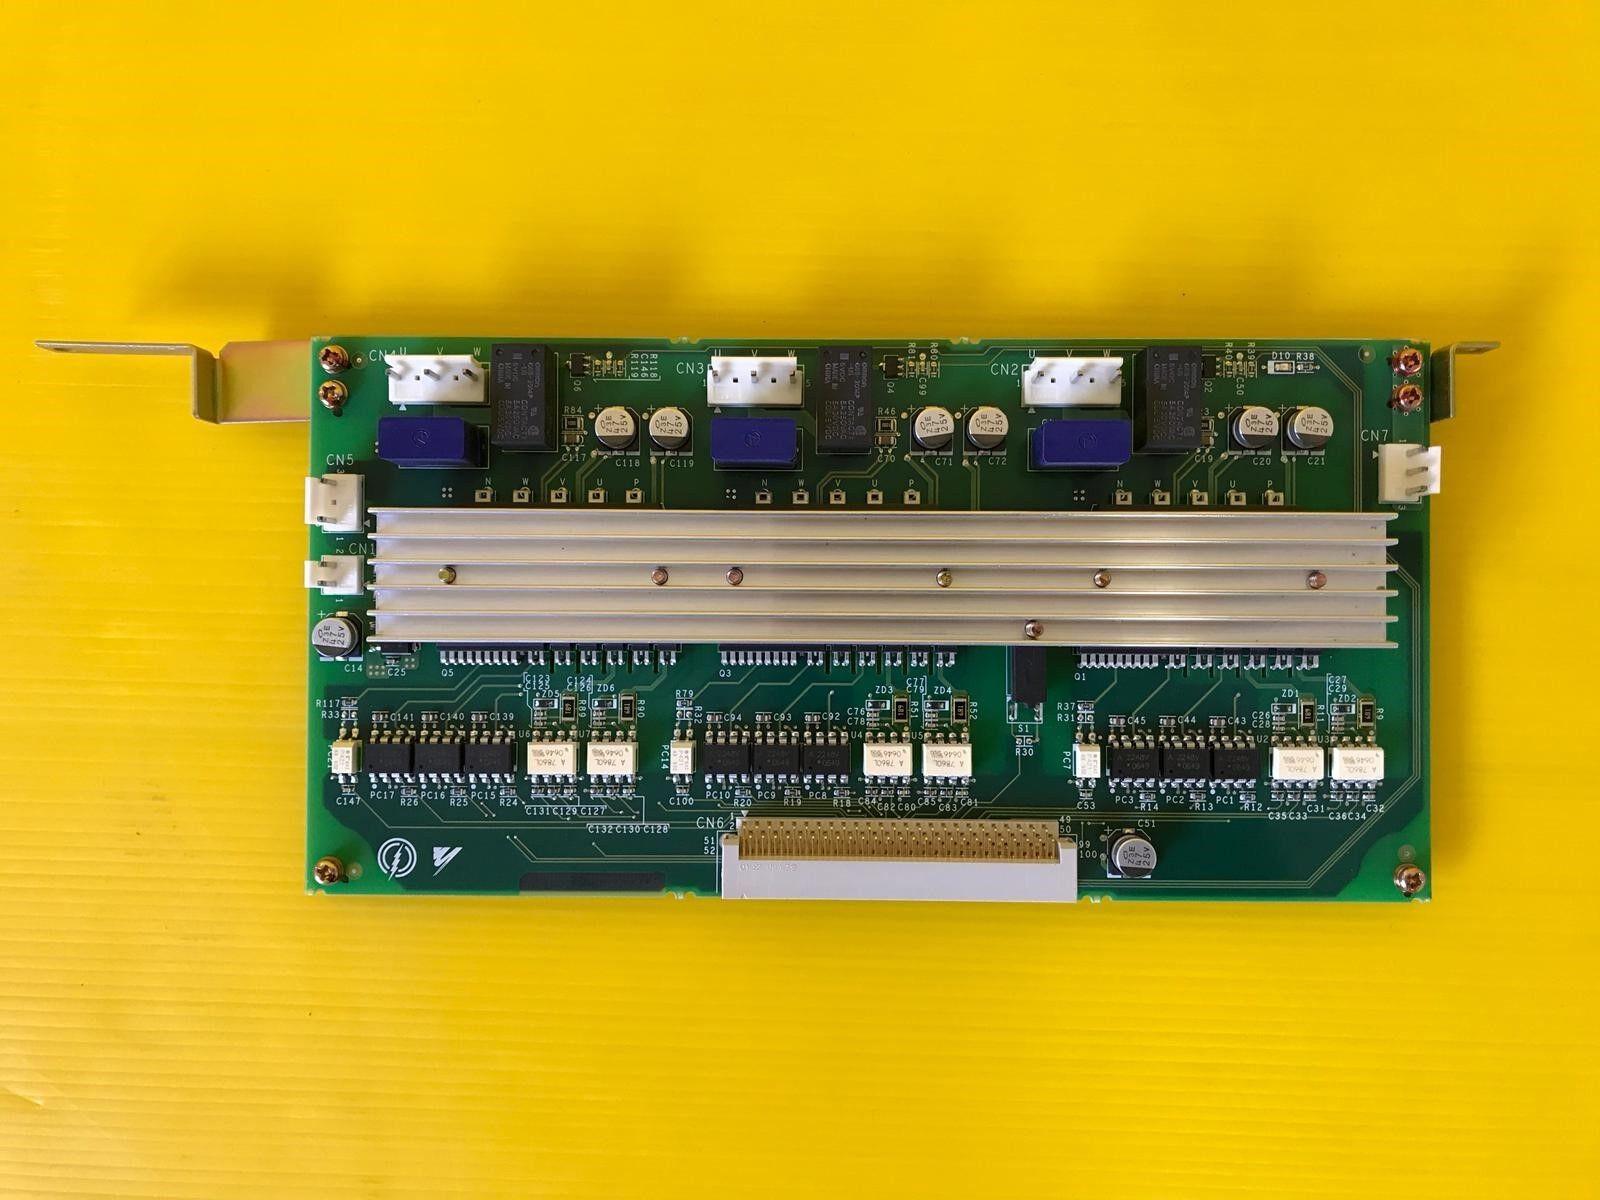 YASKAWA ELECTRIC F352085-1 SGDR-SDCCA01 Robot Controller Card